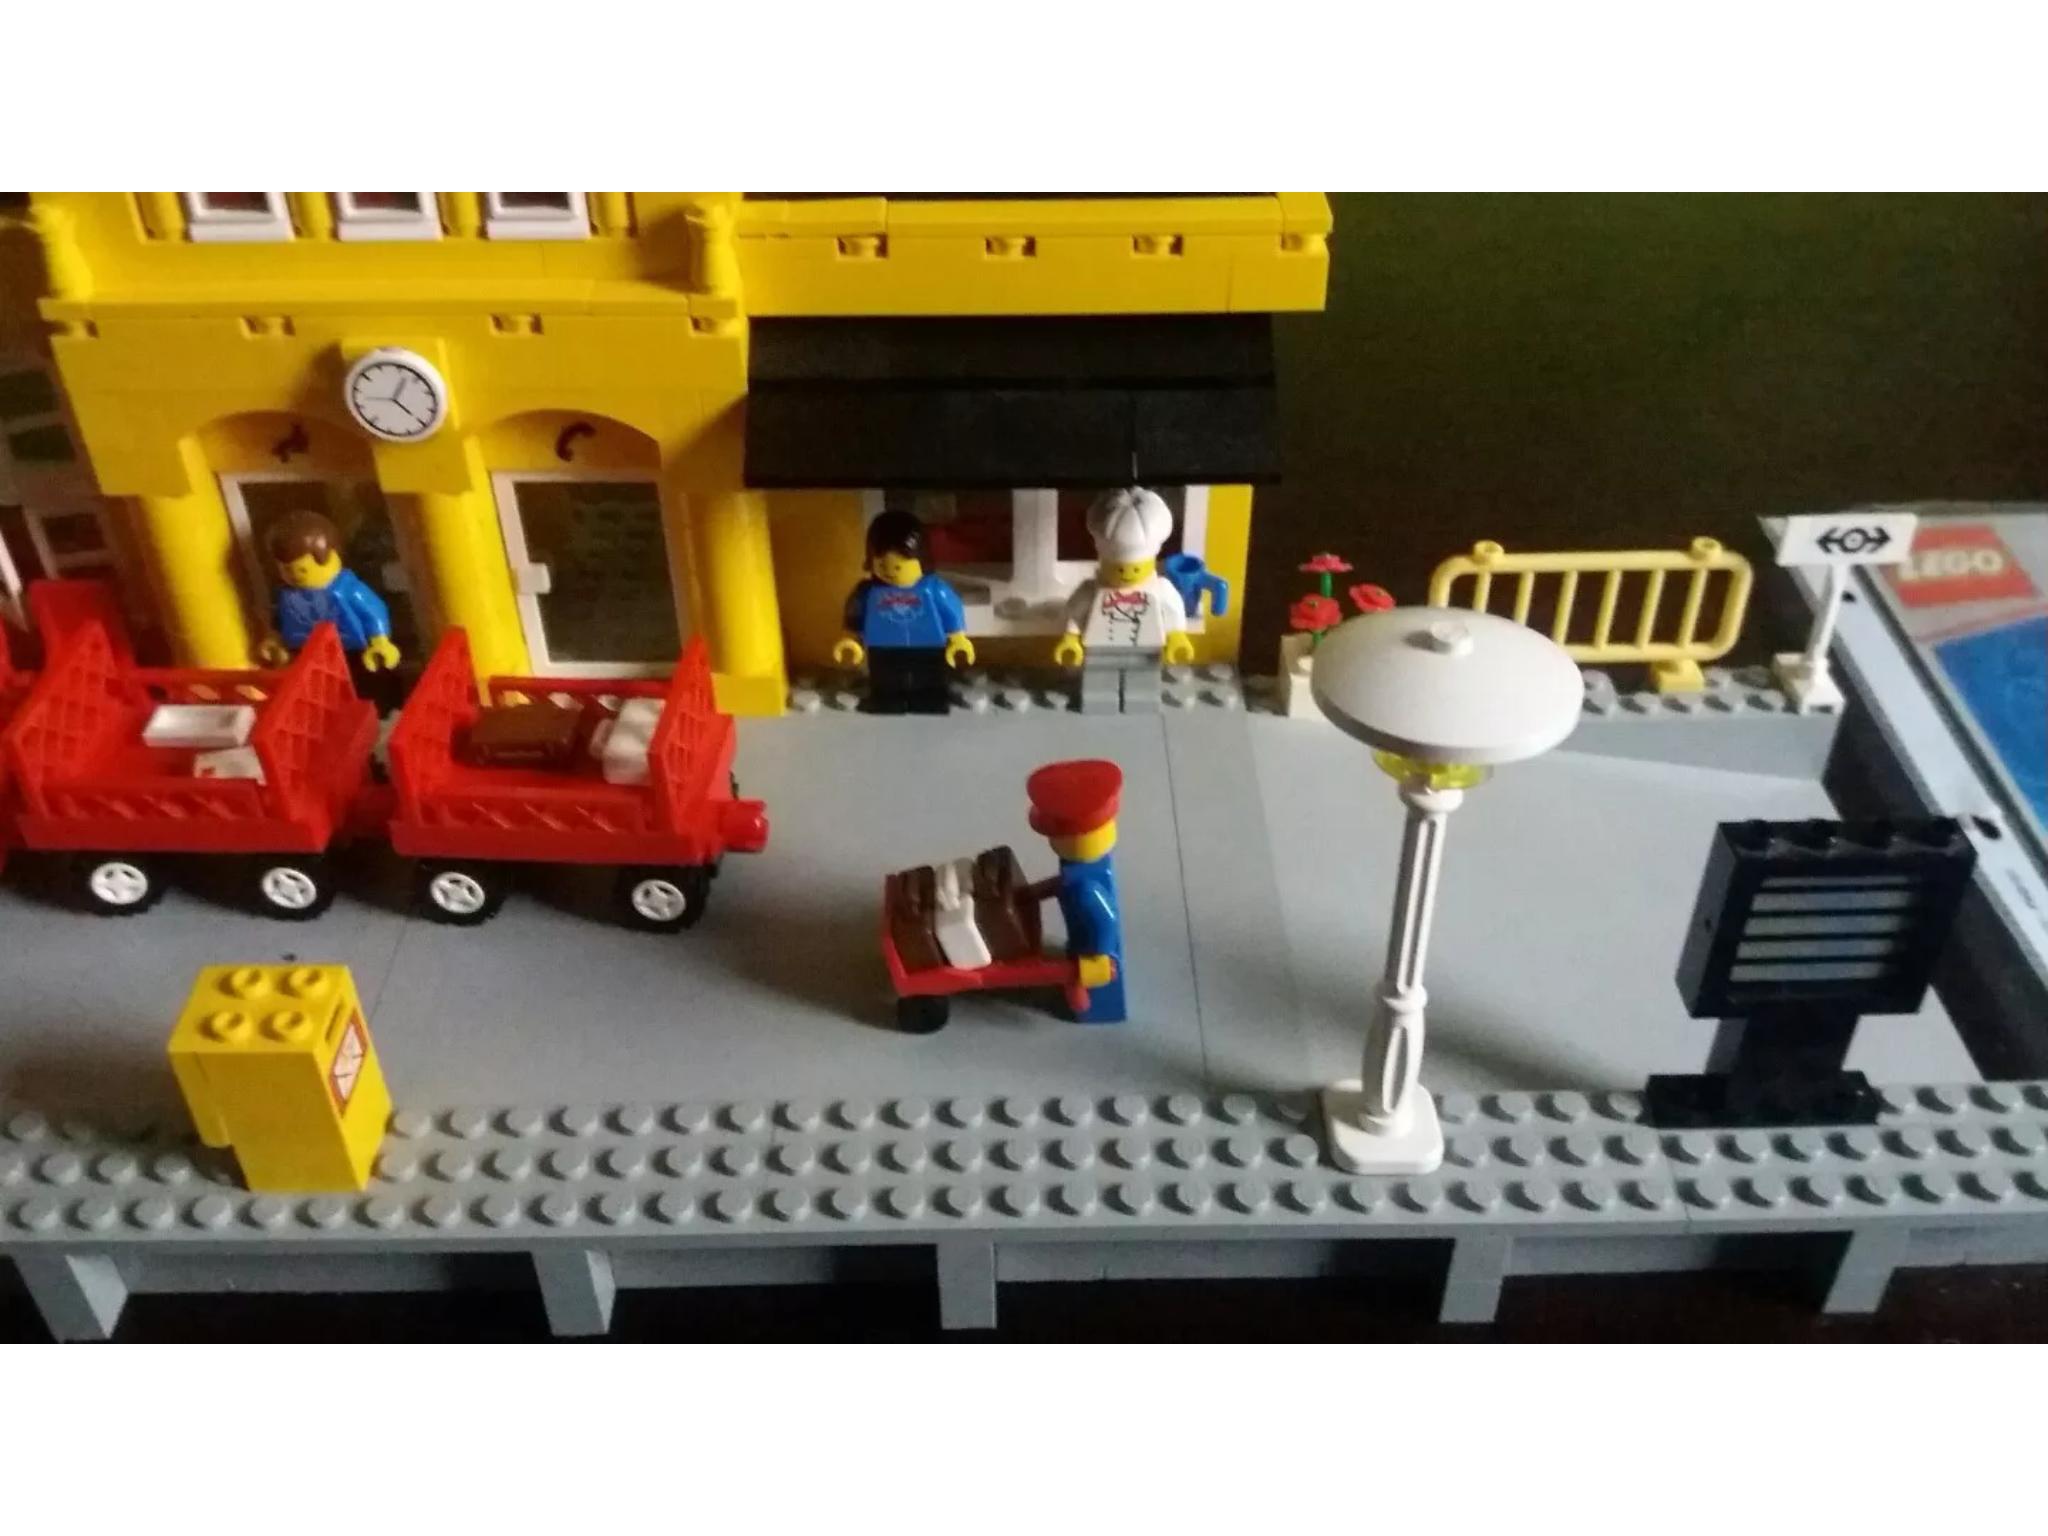 pin by stefan misch on lego ideen | pinterest